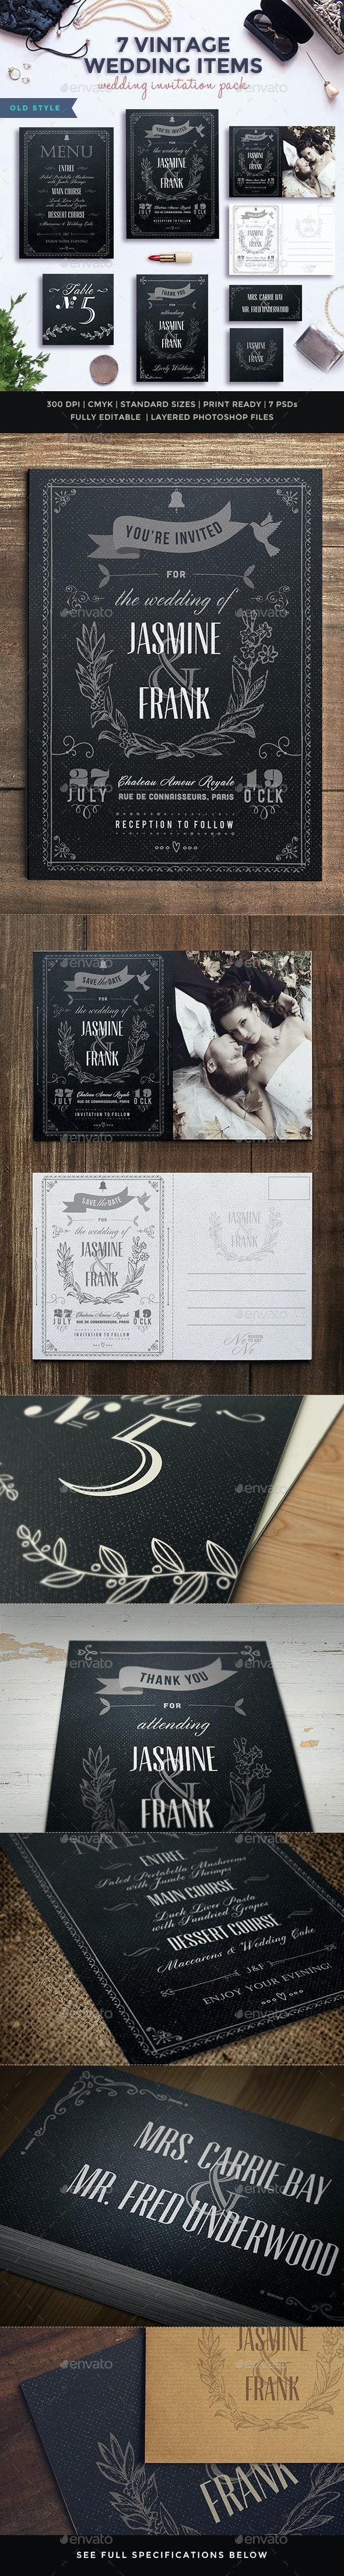 7 Vintage Items - Wedding Pack - Weddings Cards & Invites